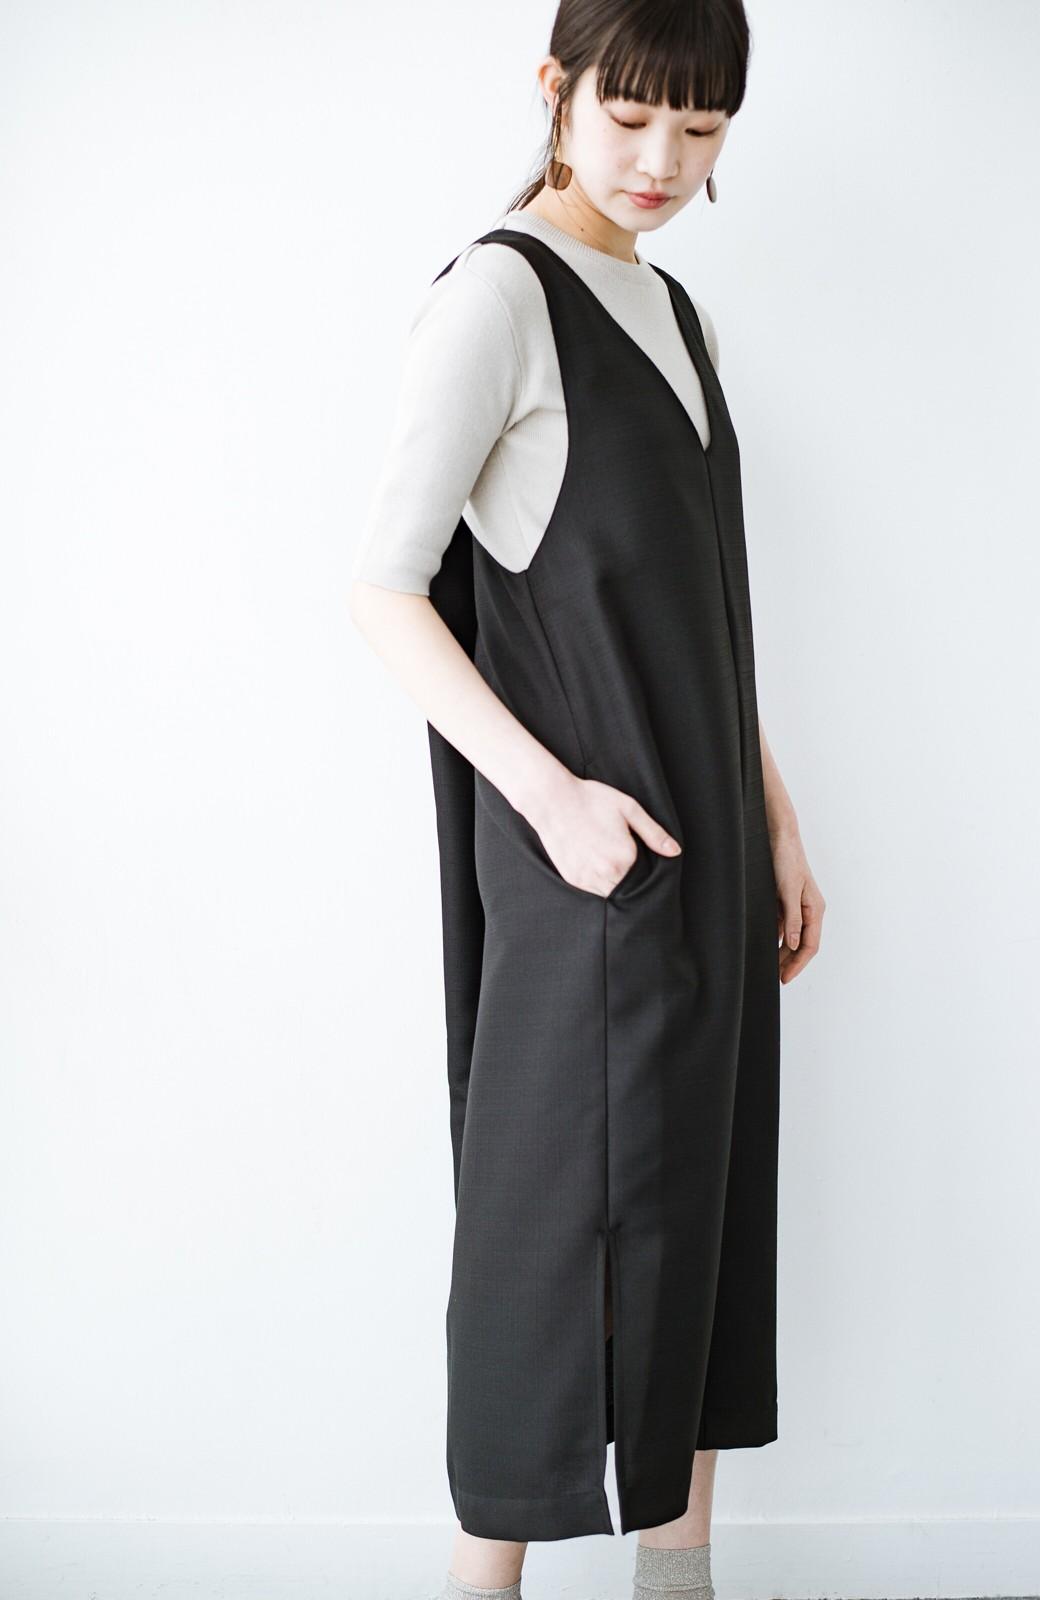 haco! 何てことないTシャツと重ねるだけでパッとかわいくなれる 魔法のようなジャンパースカート <ブラック>の商品写真15